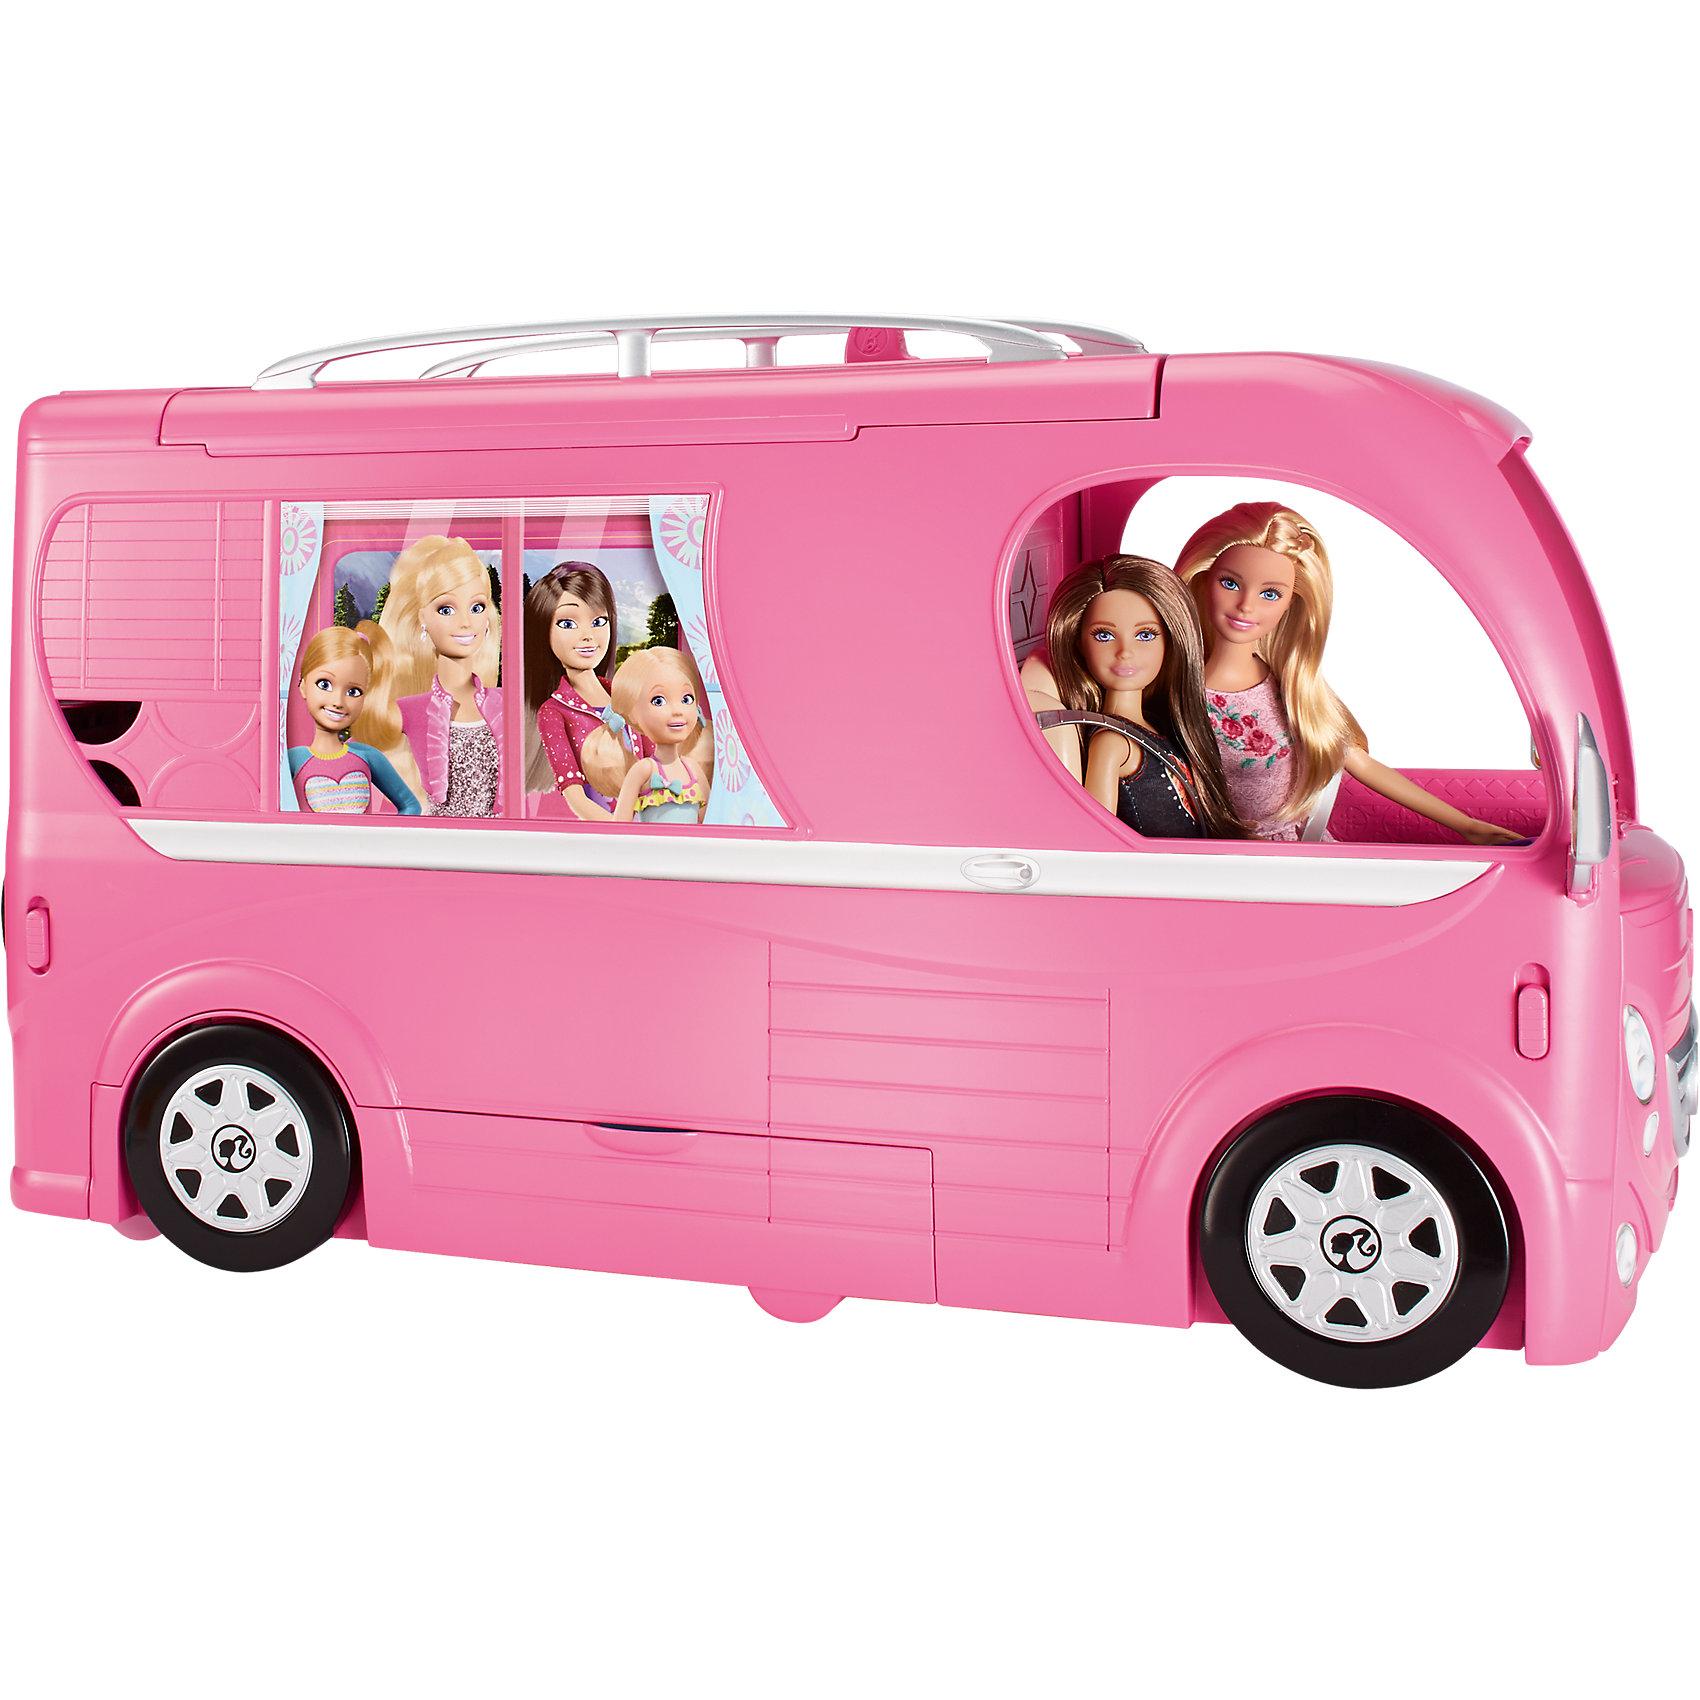 Фургон для путешествий, Barbie